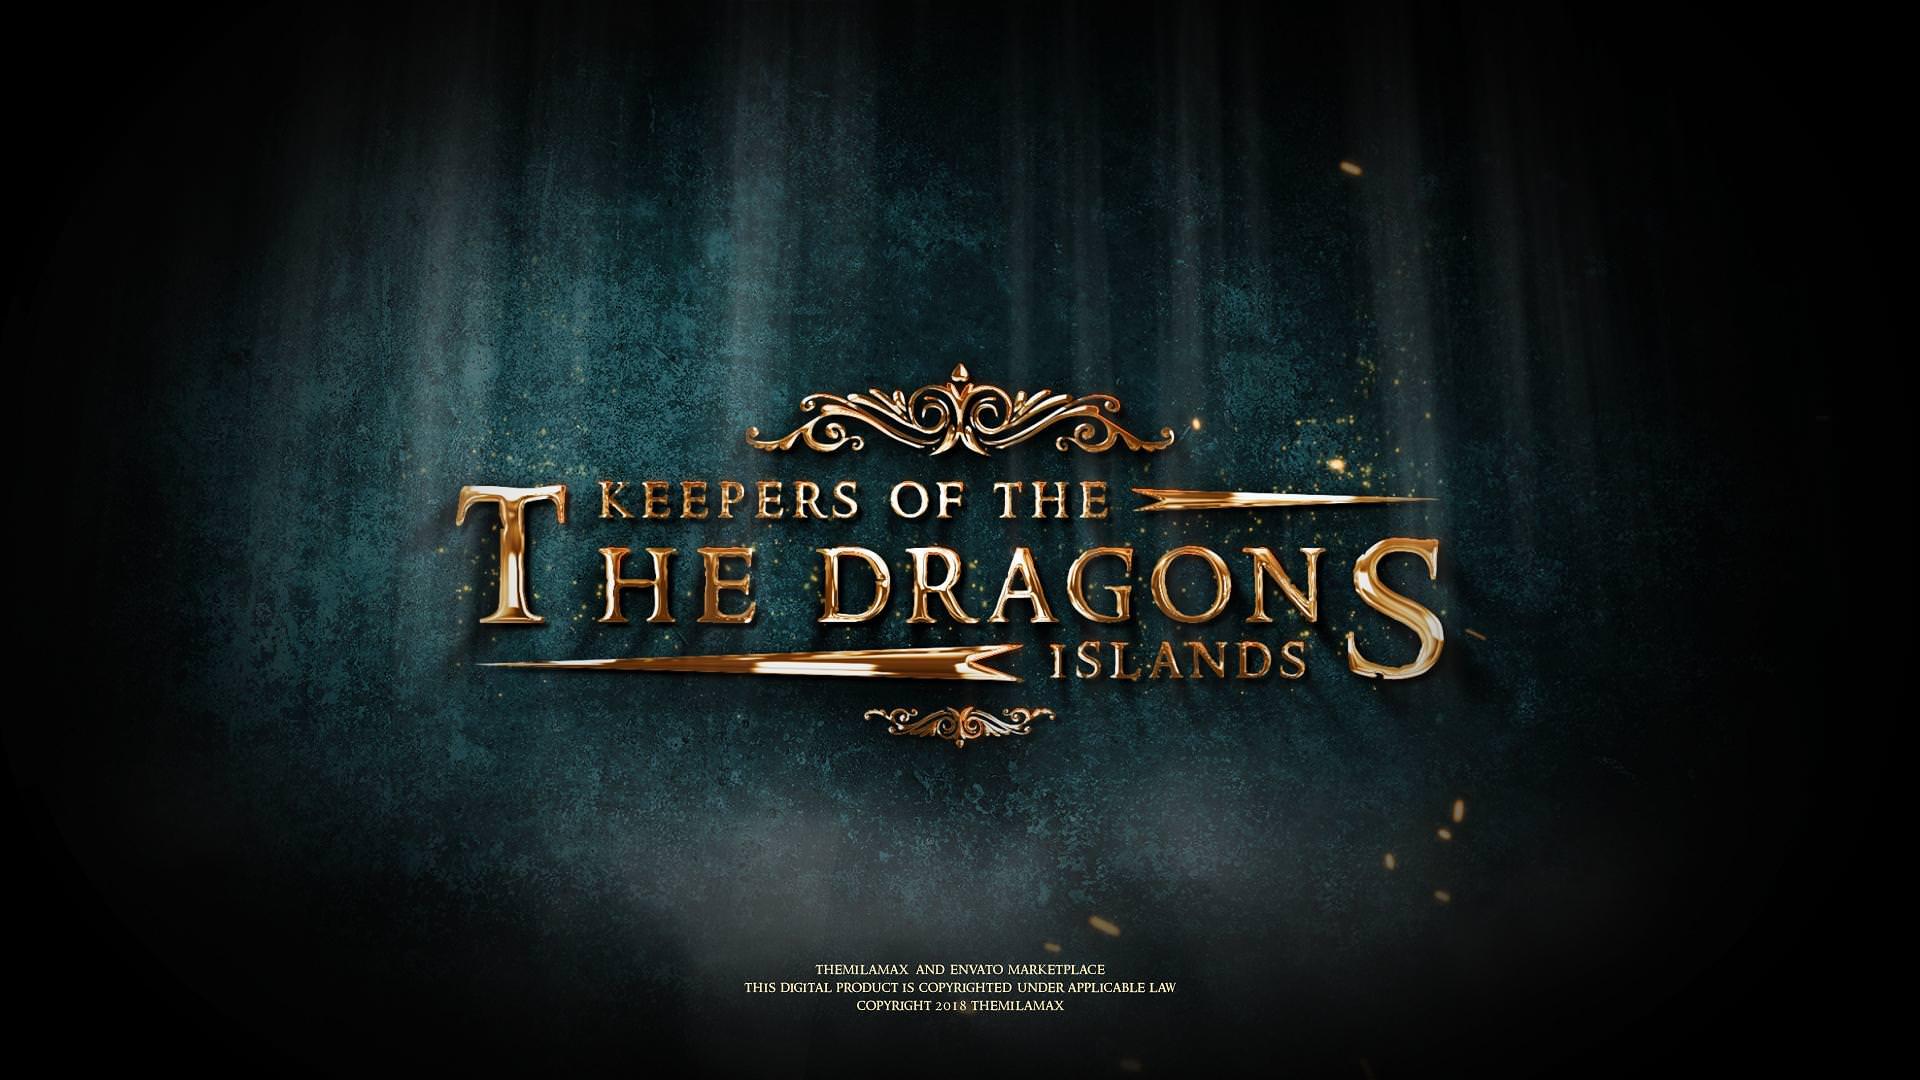 Dragons Islands - The Fantasy Trailer - 8